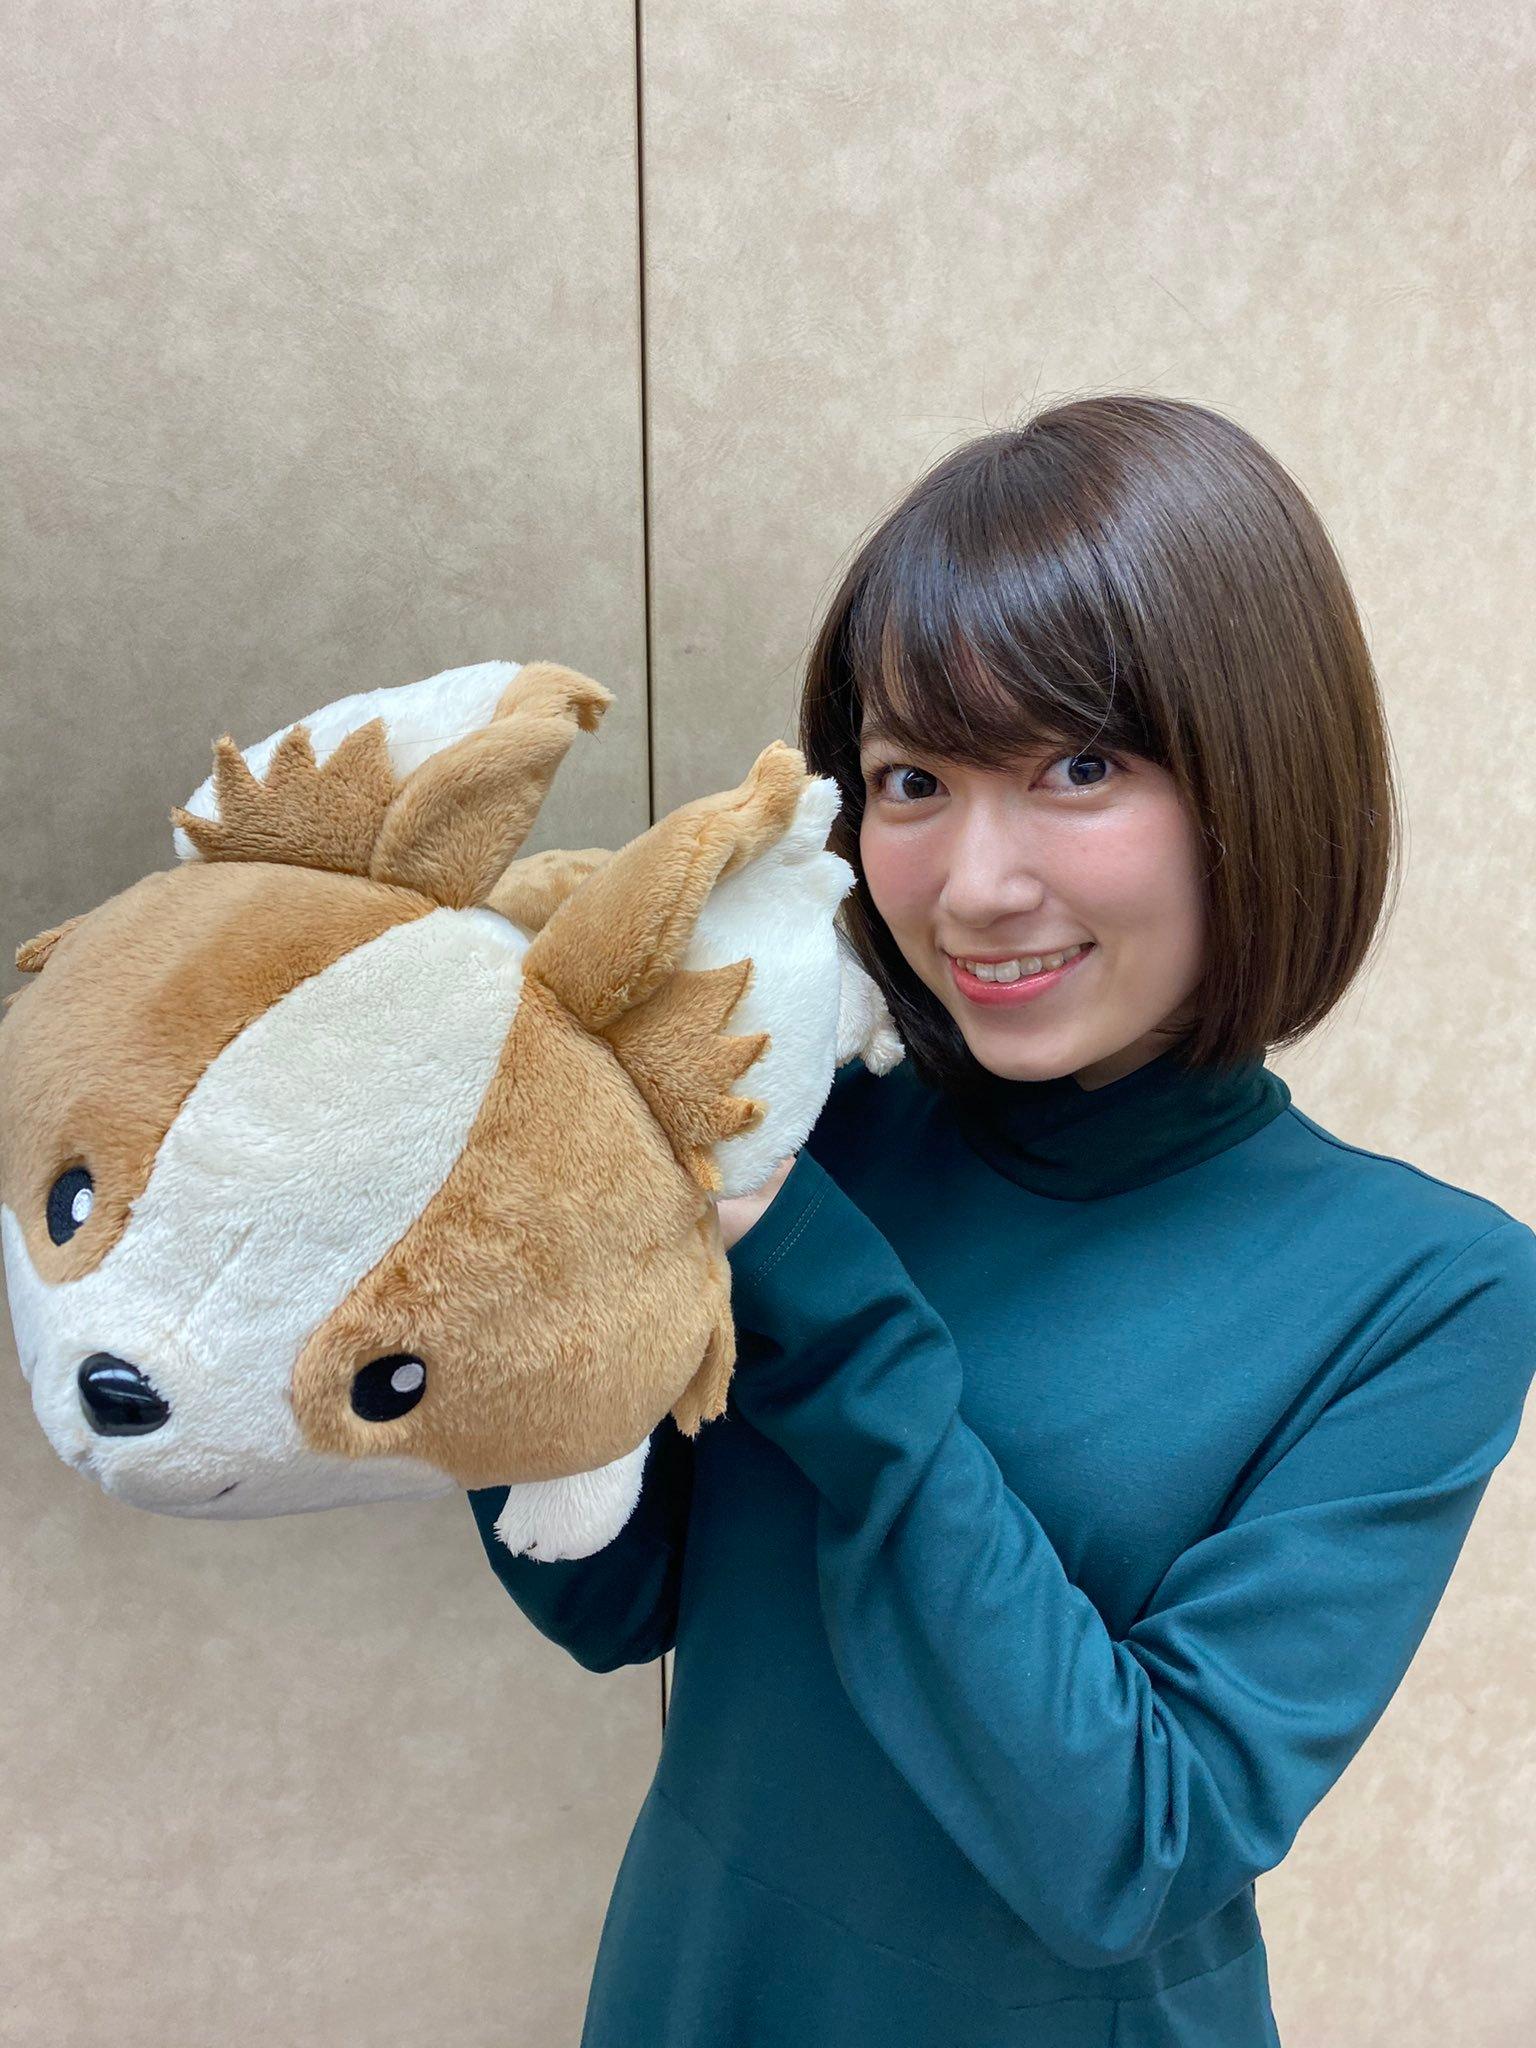 TomoyoKurosawa 1333005653225271296_p1